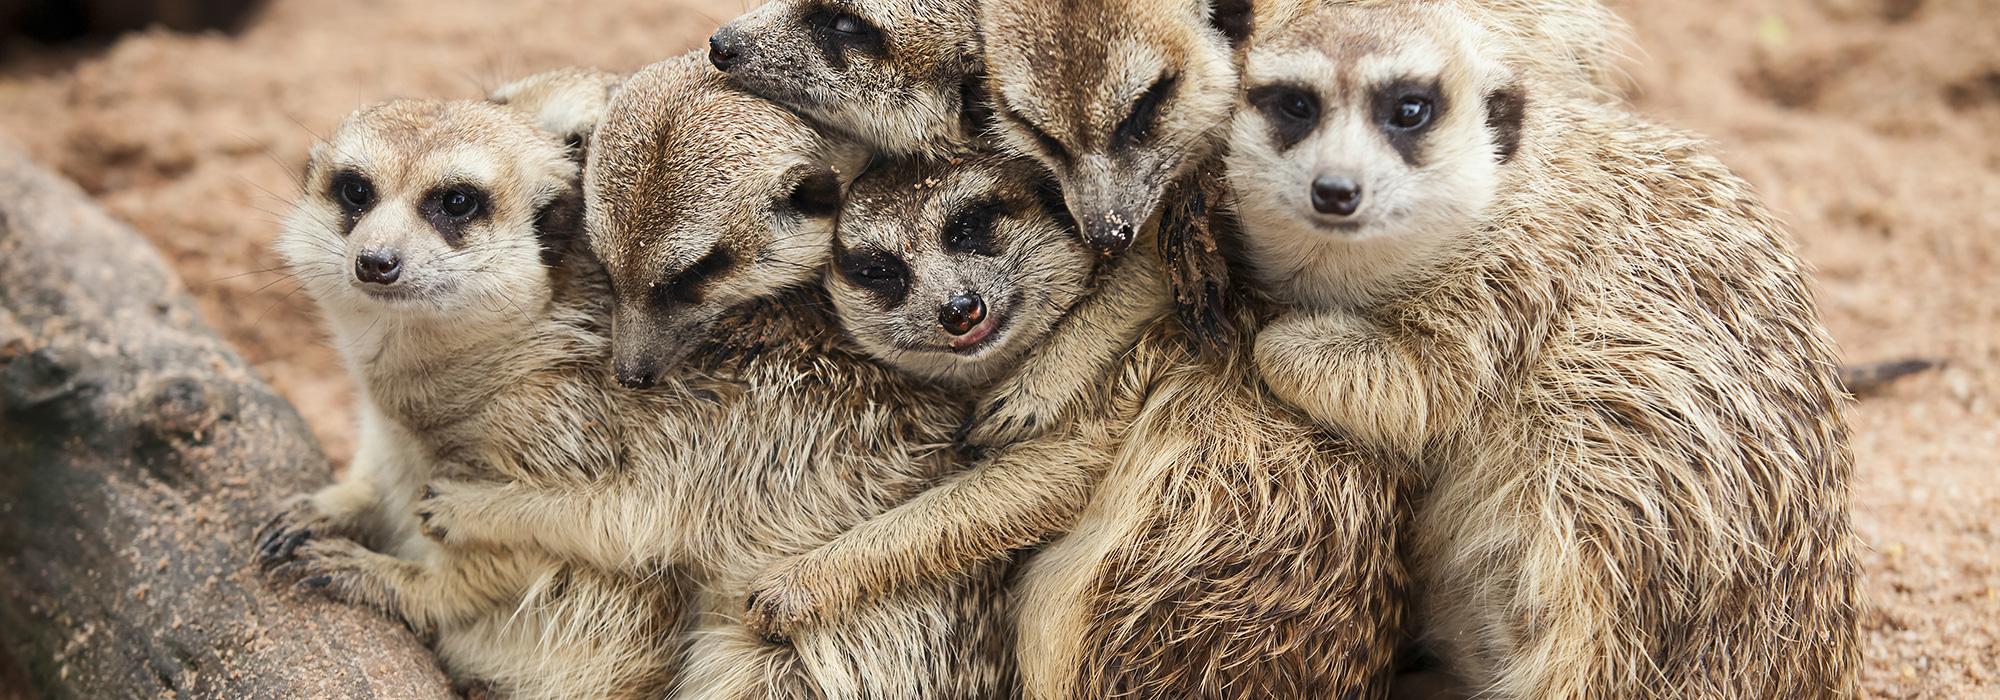 Meerkat Family